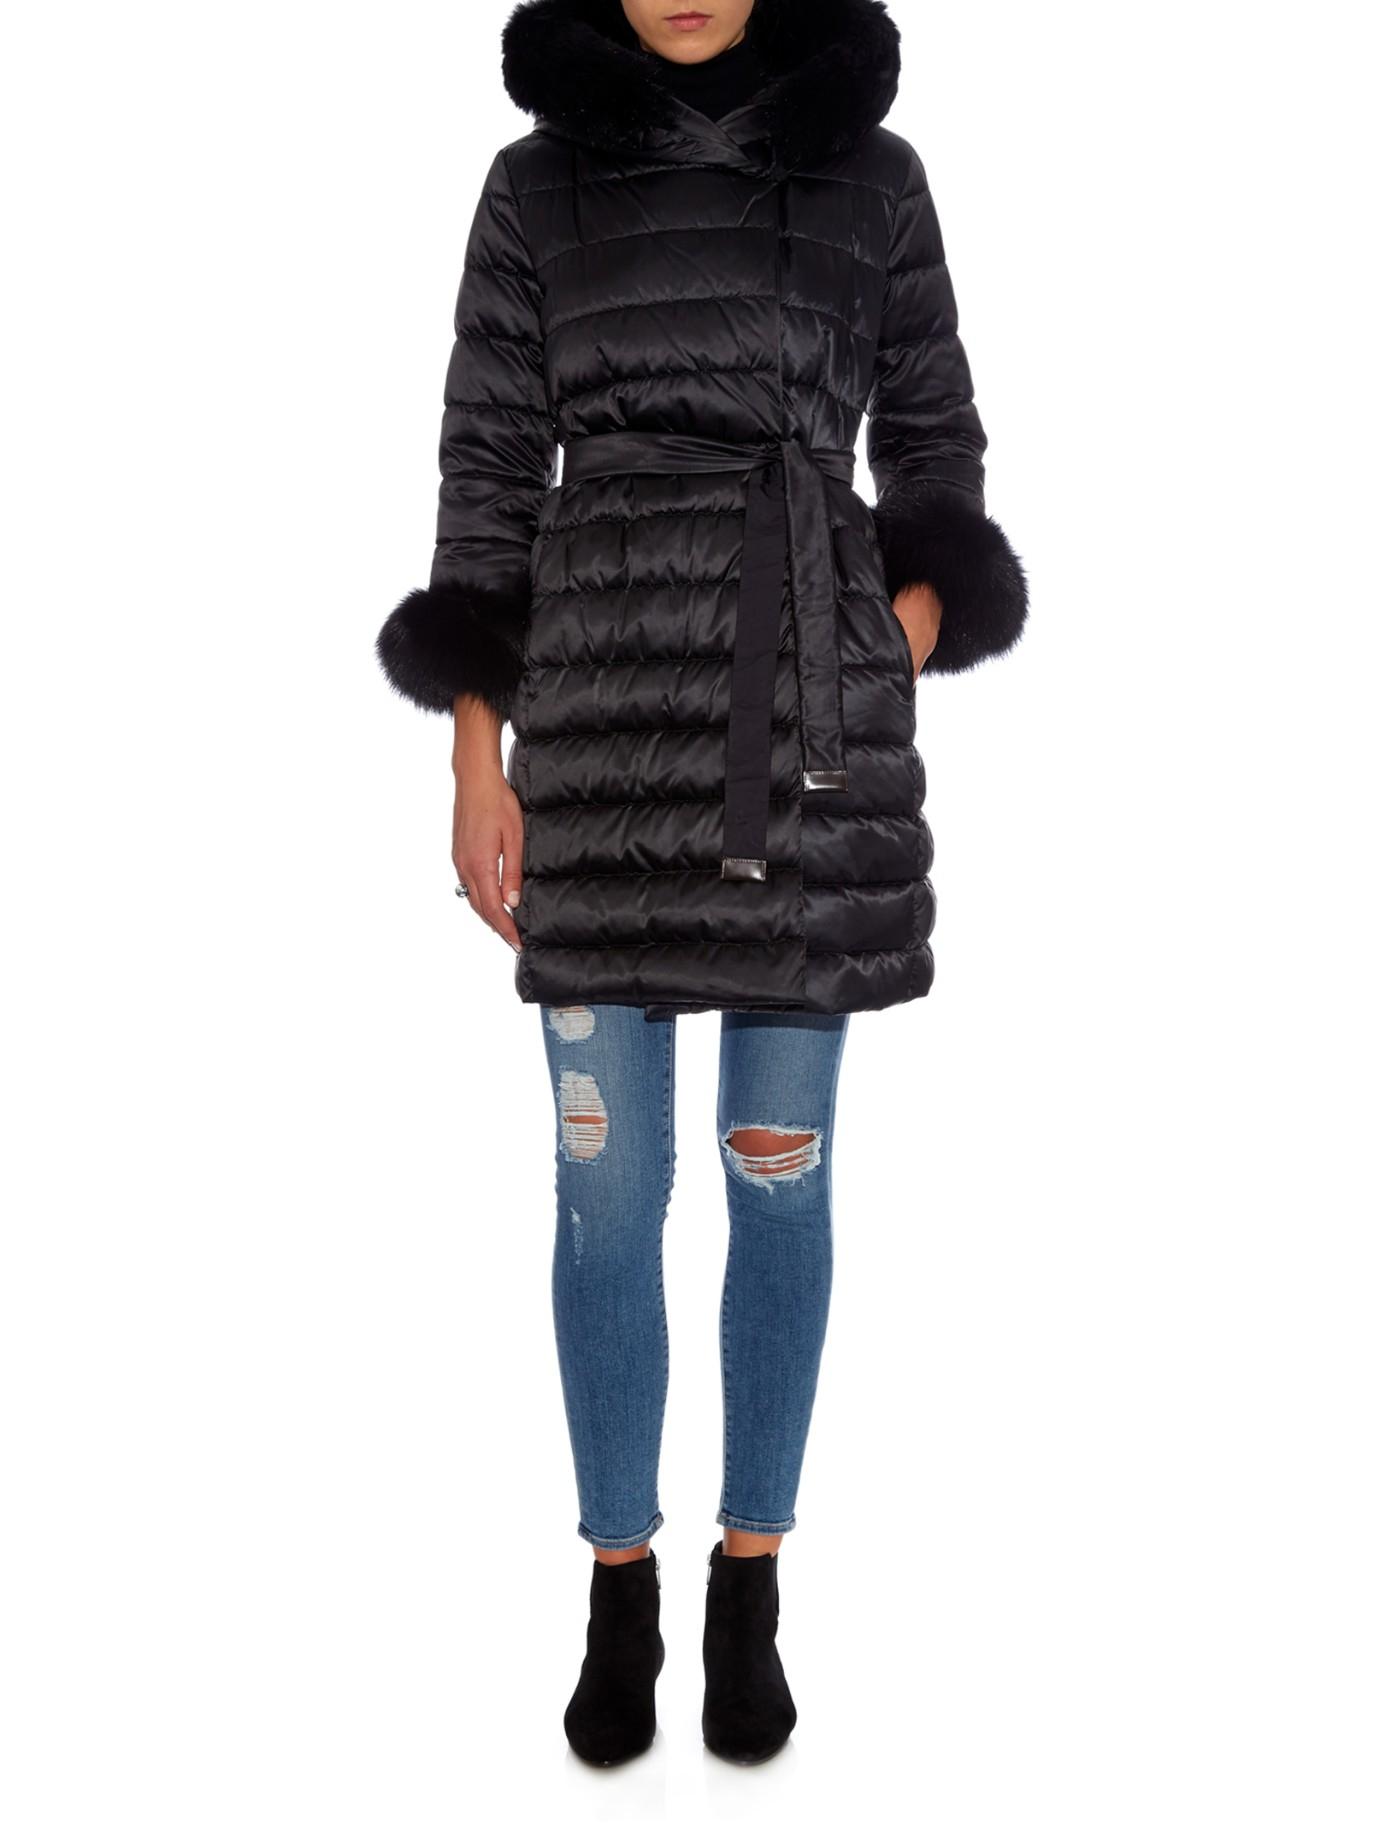 Lyst - 's max mara Cube Novef Reversible Coat in Black : max mara quilted jacket - Adamdwight.com